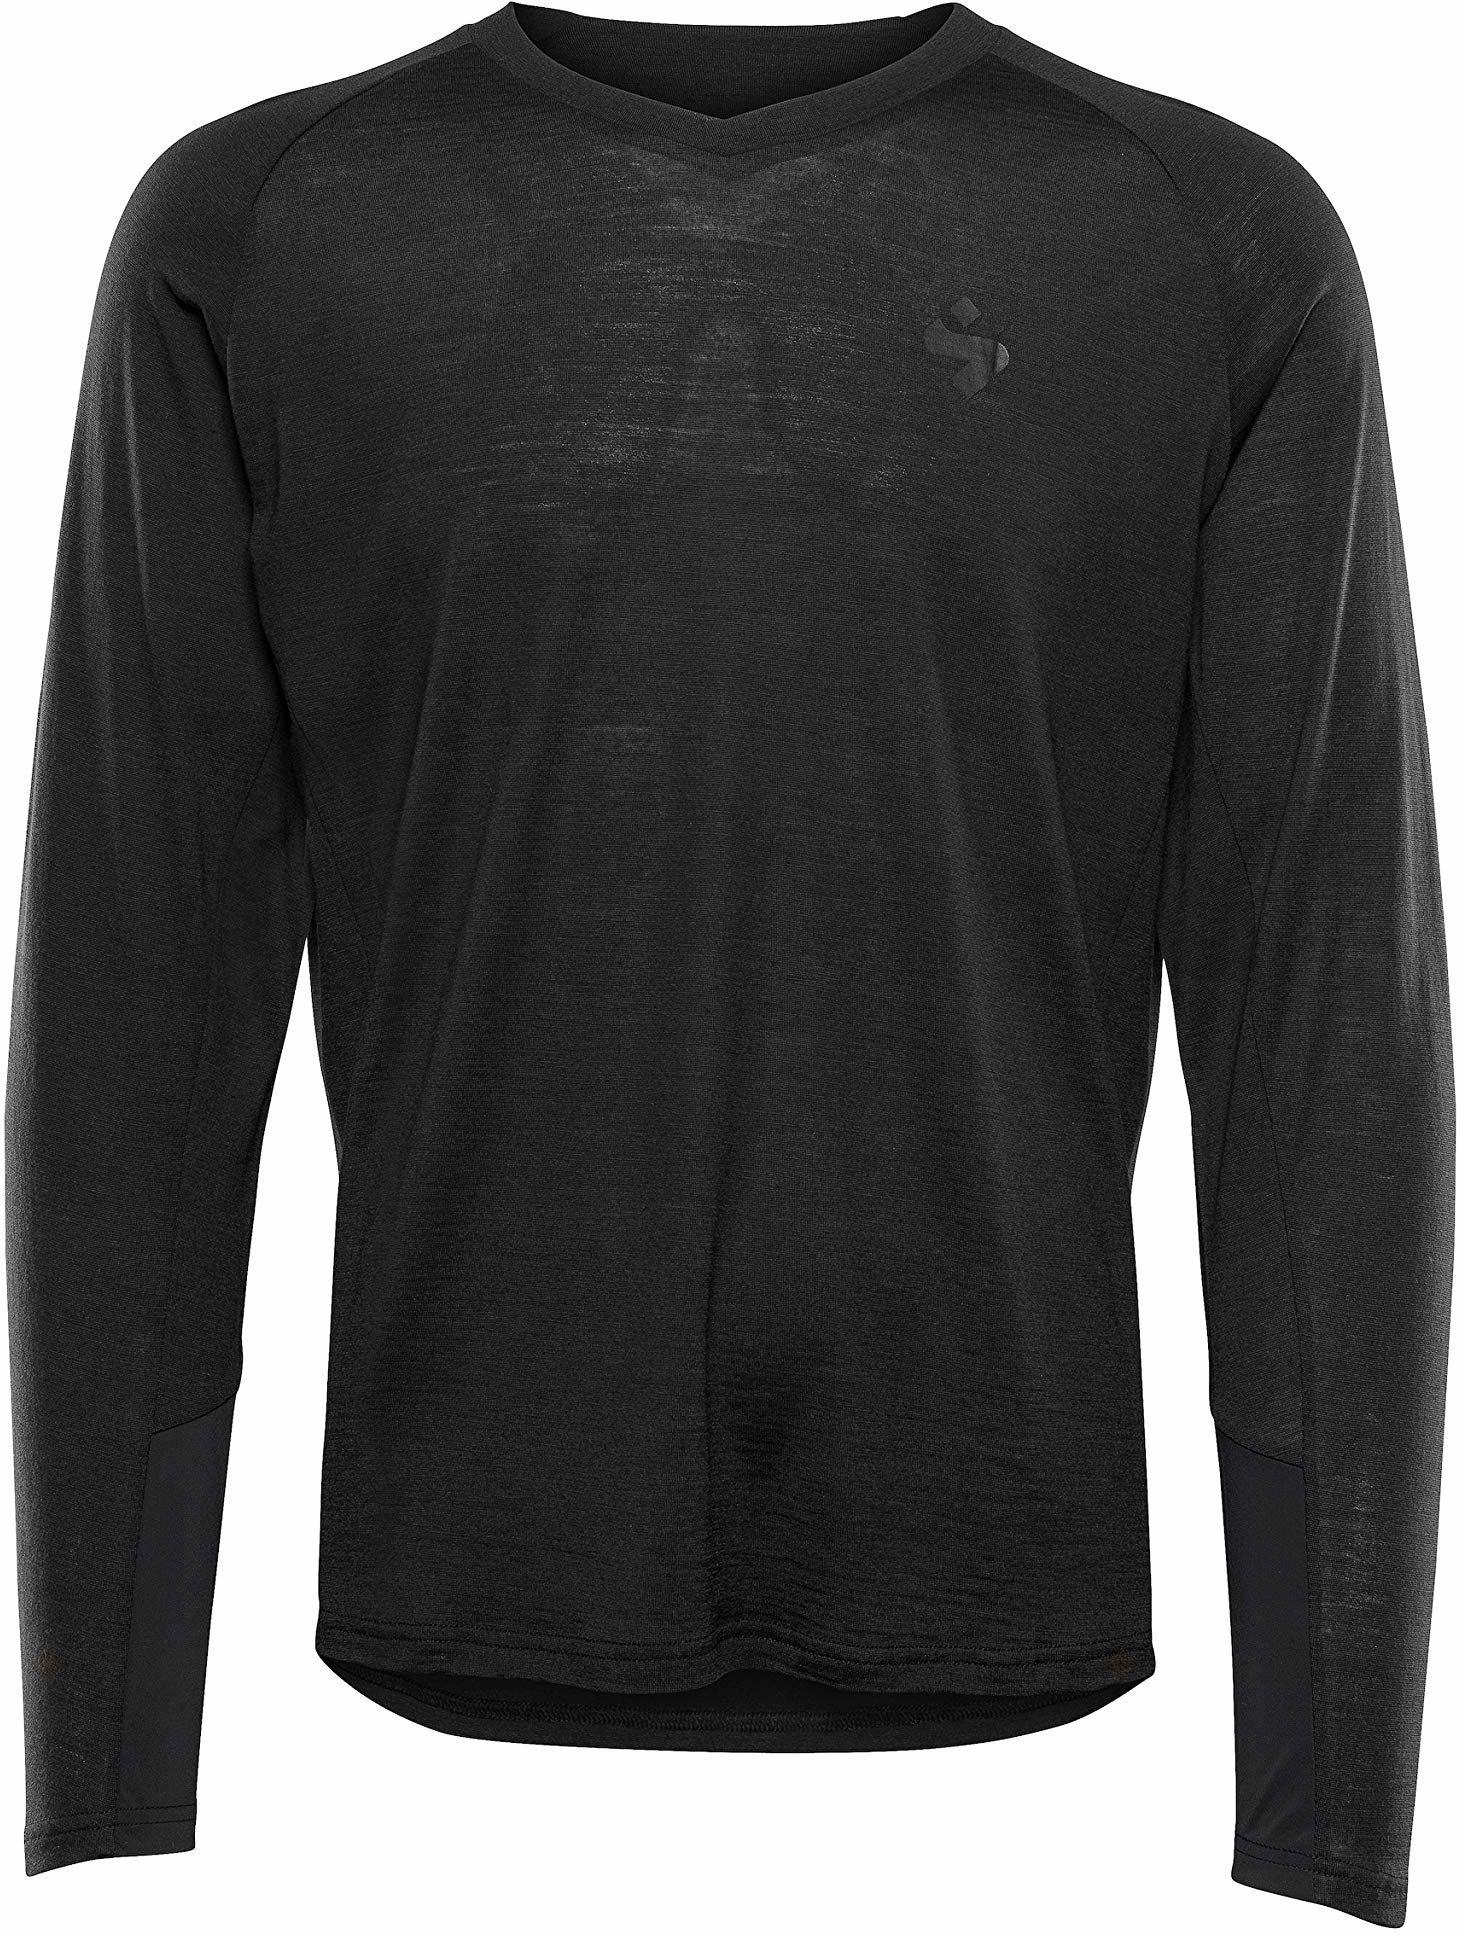 Sweet Protection Hunter Merino LS męska koszulka M, męska, koszulka, 828079, czarna, L